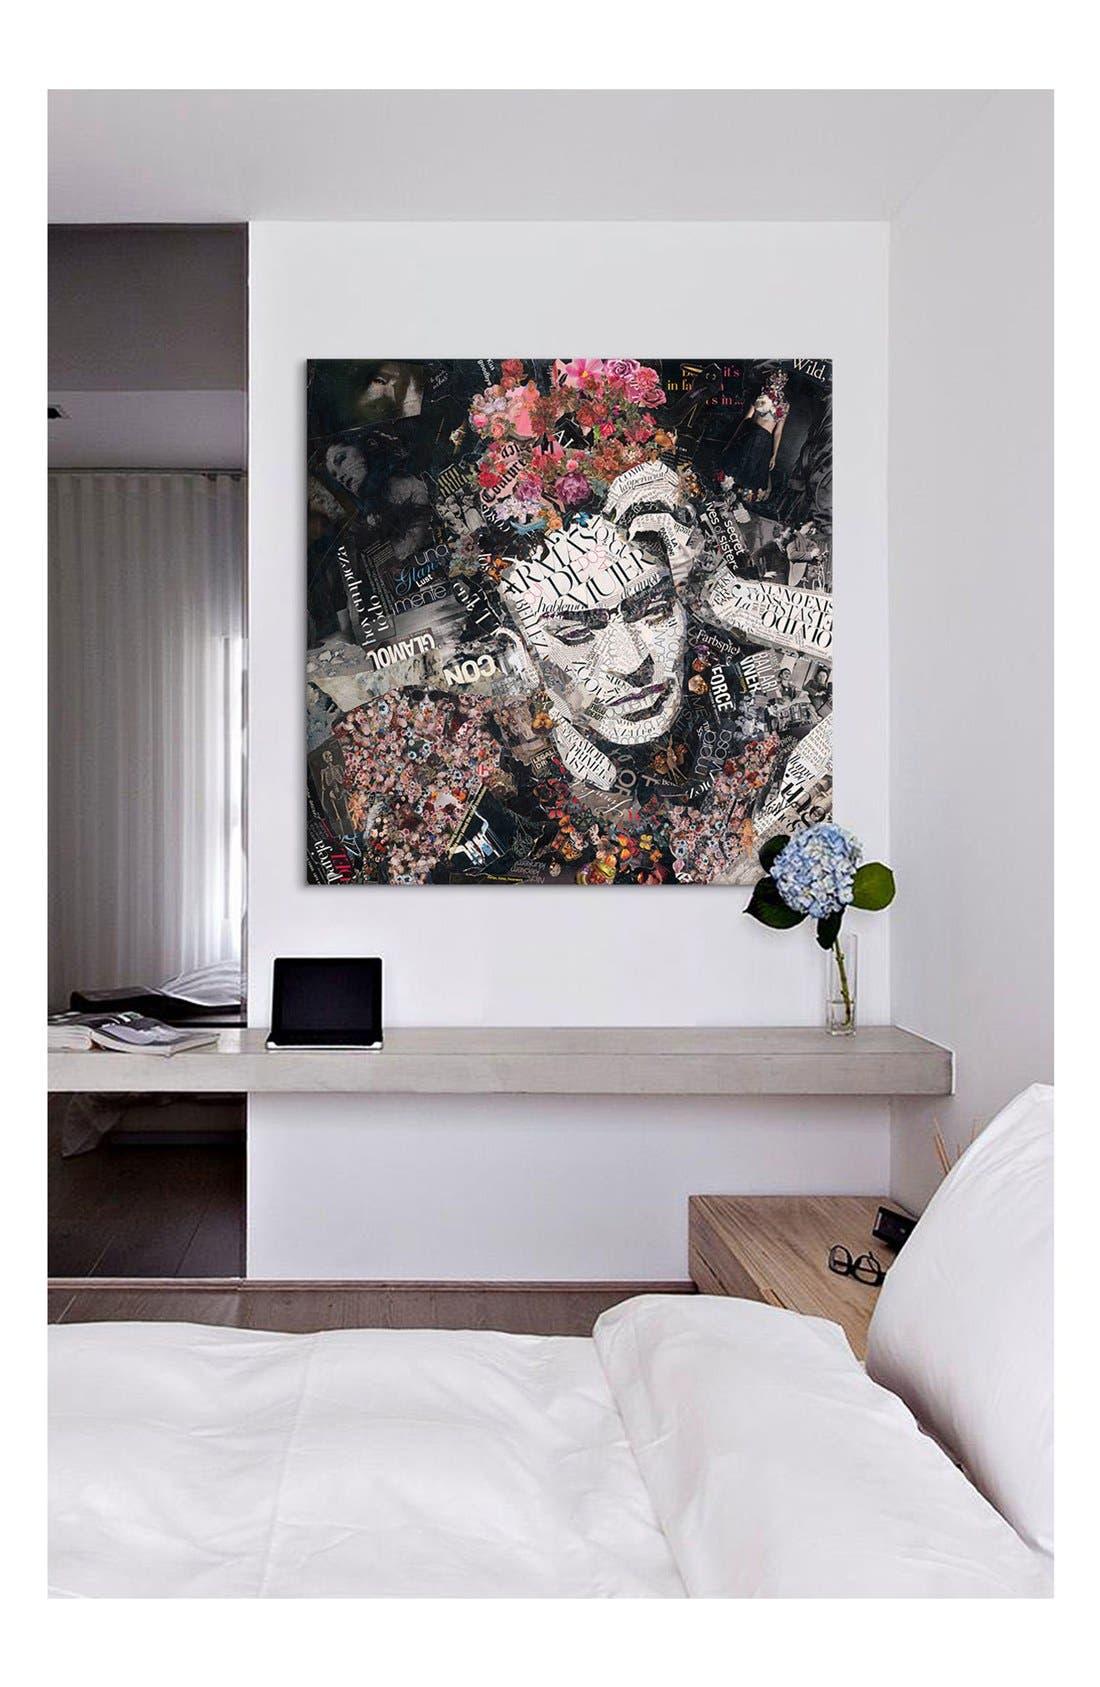 'Armas de Mujer - Ines Kouidis' Giclée Print Canvas Art,                             Alternate thumbnail 2, color,                             BLACK/ WHITE/ PINK